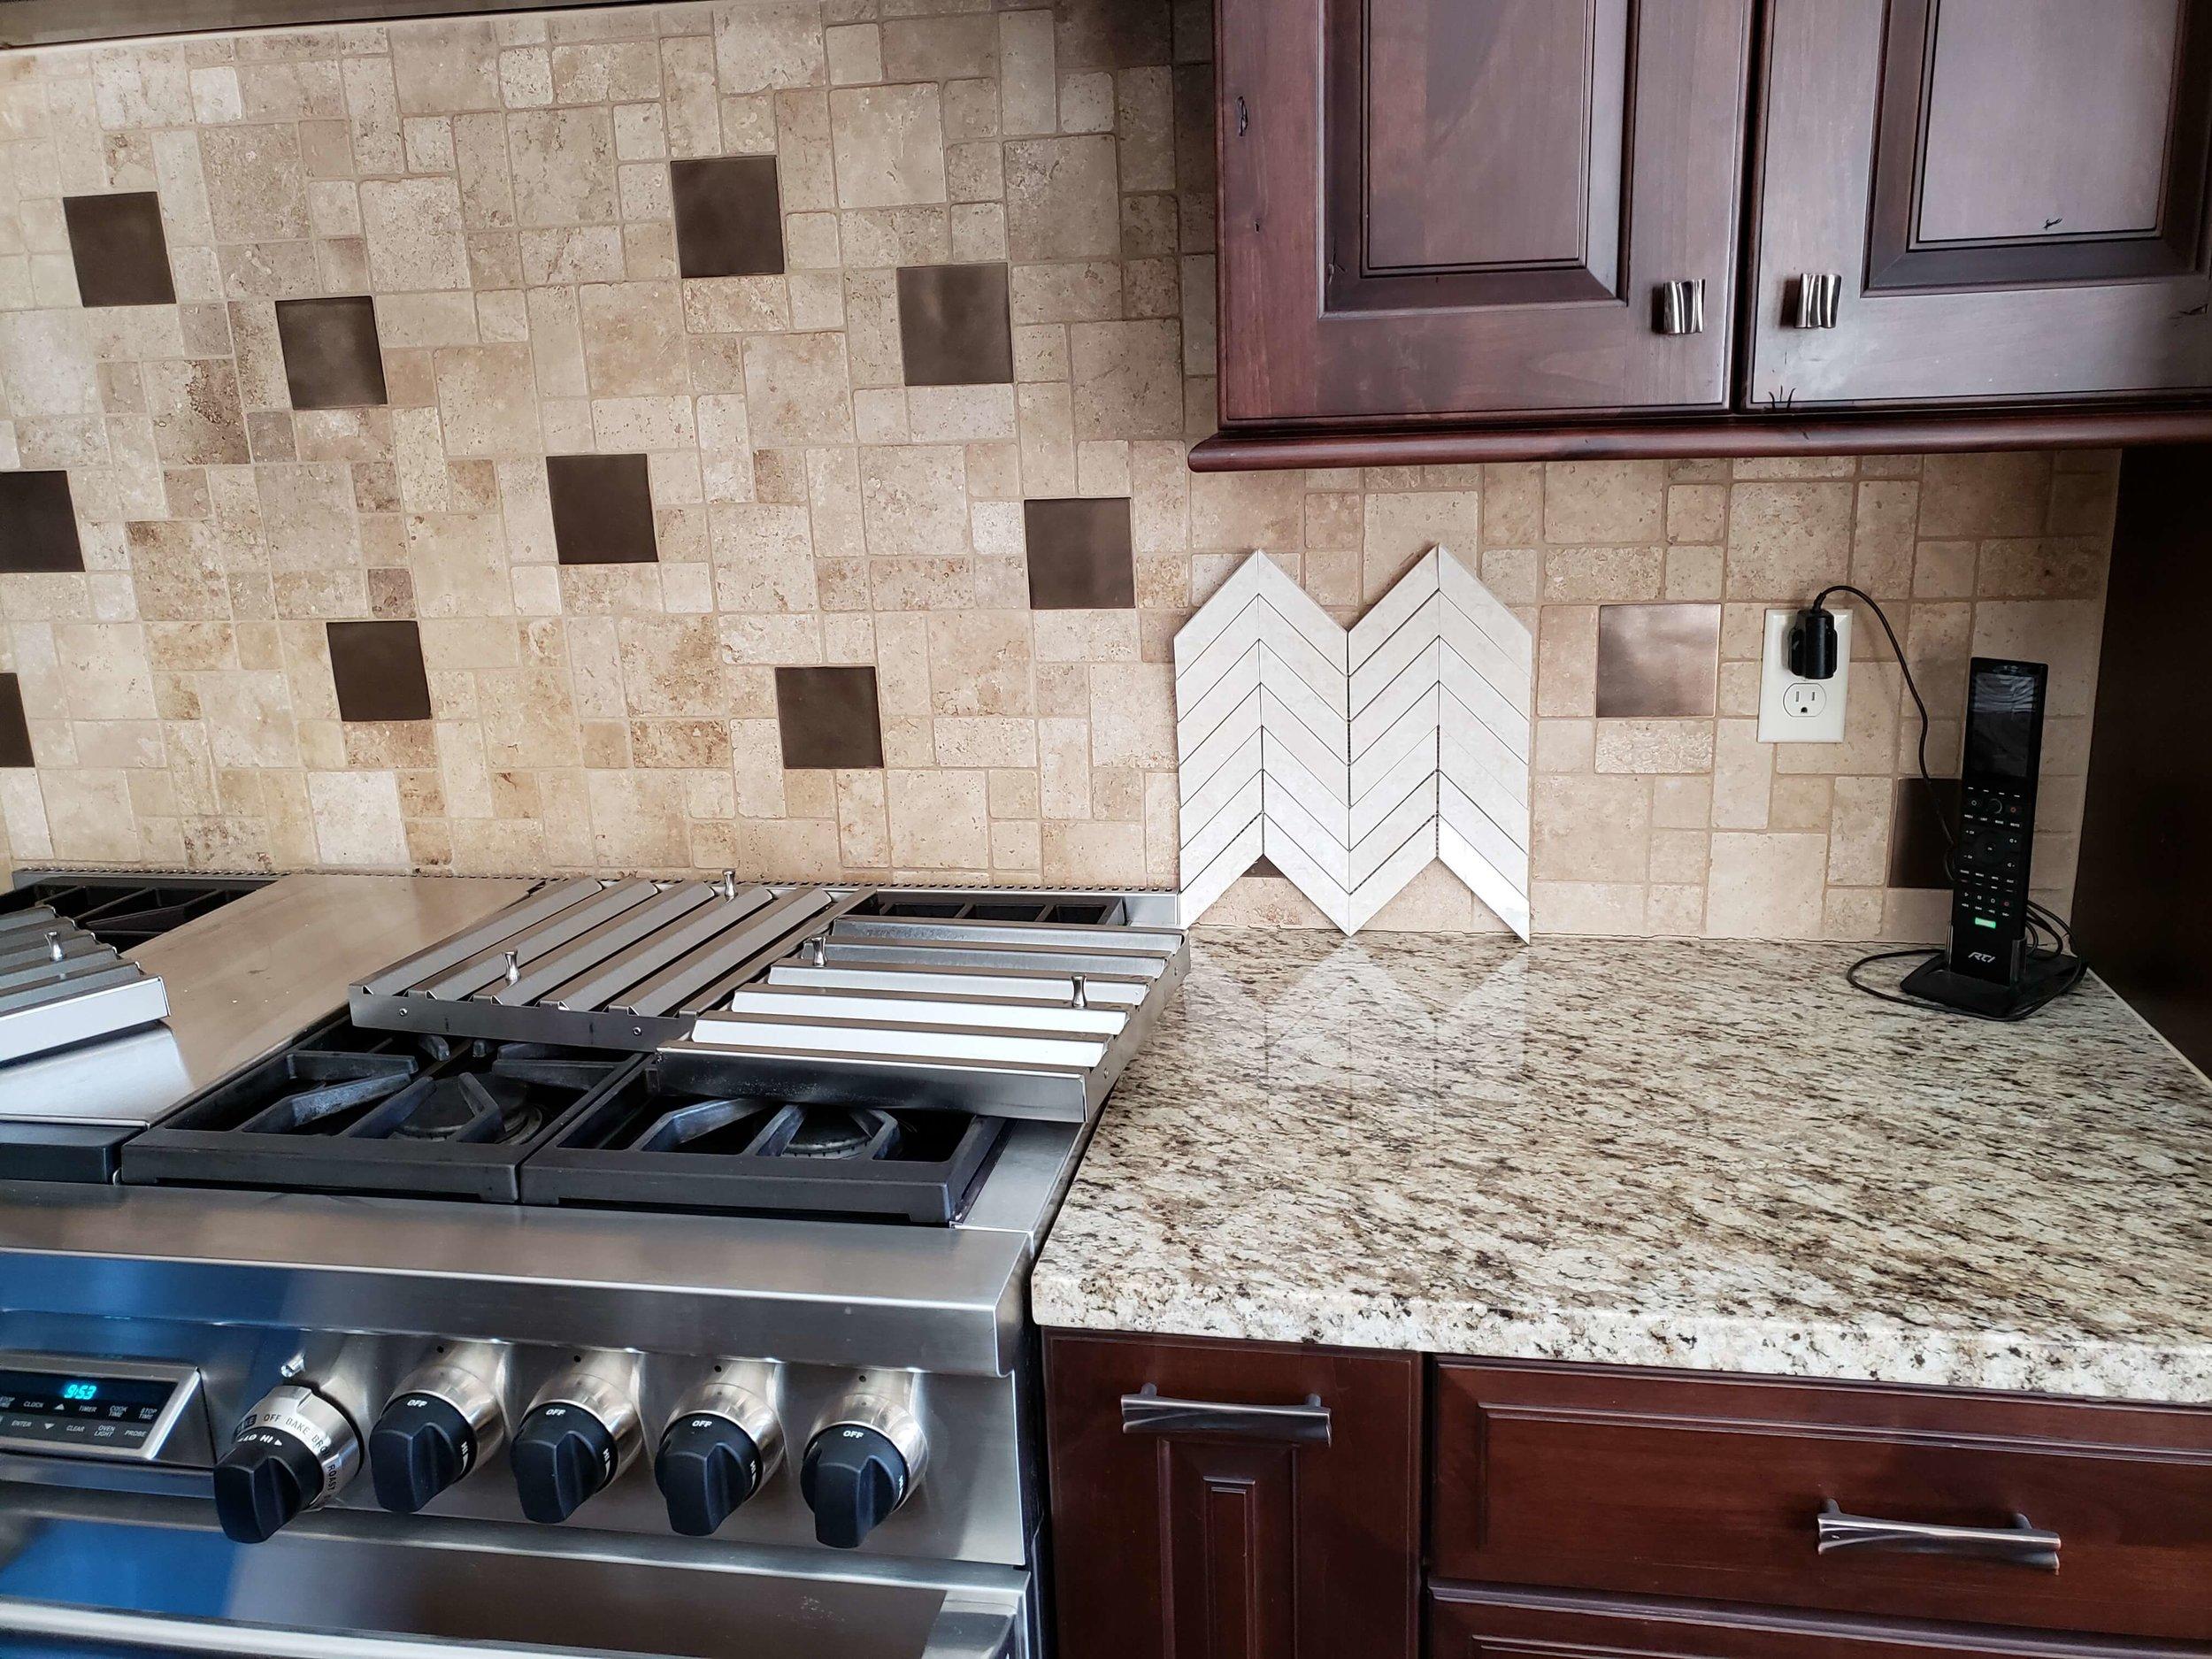 What Tile Backsplash Would Help Update